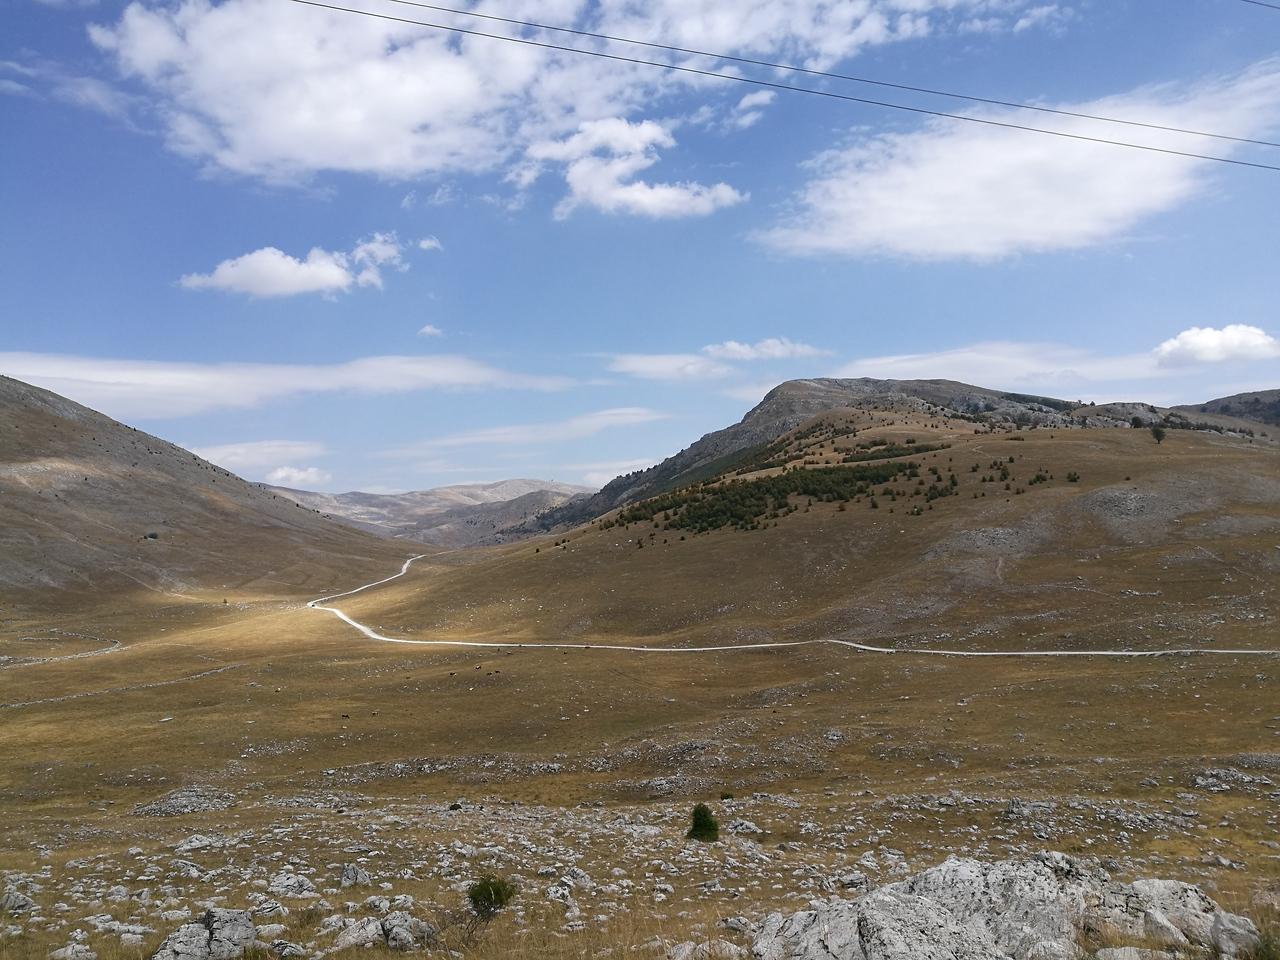 Vistas near mount Igman